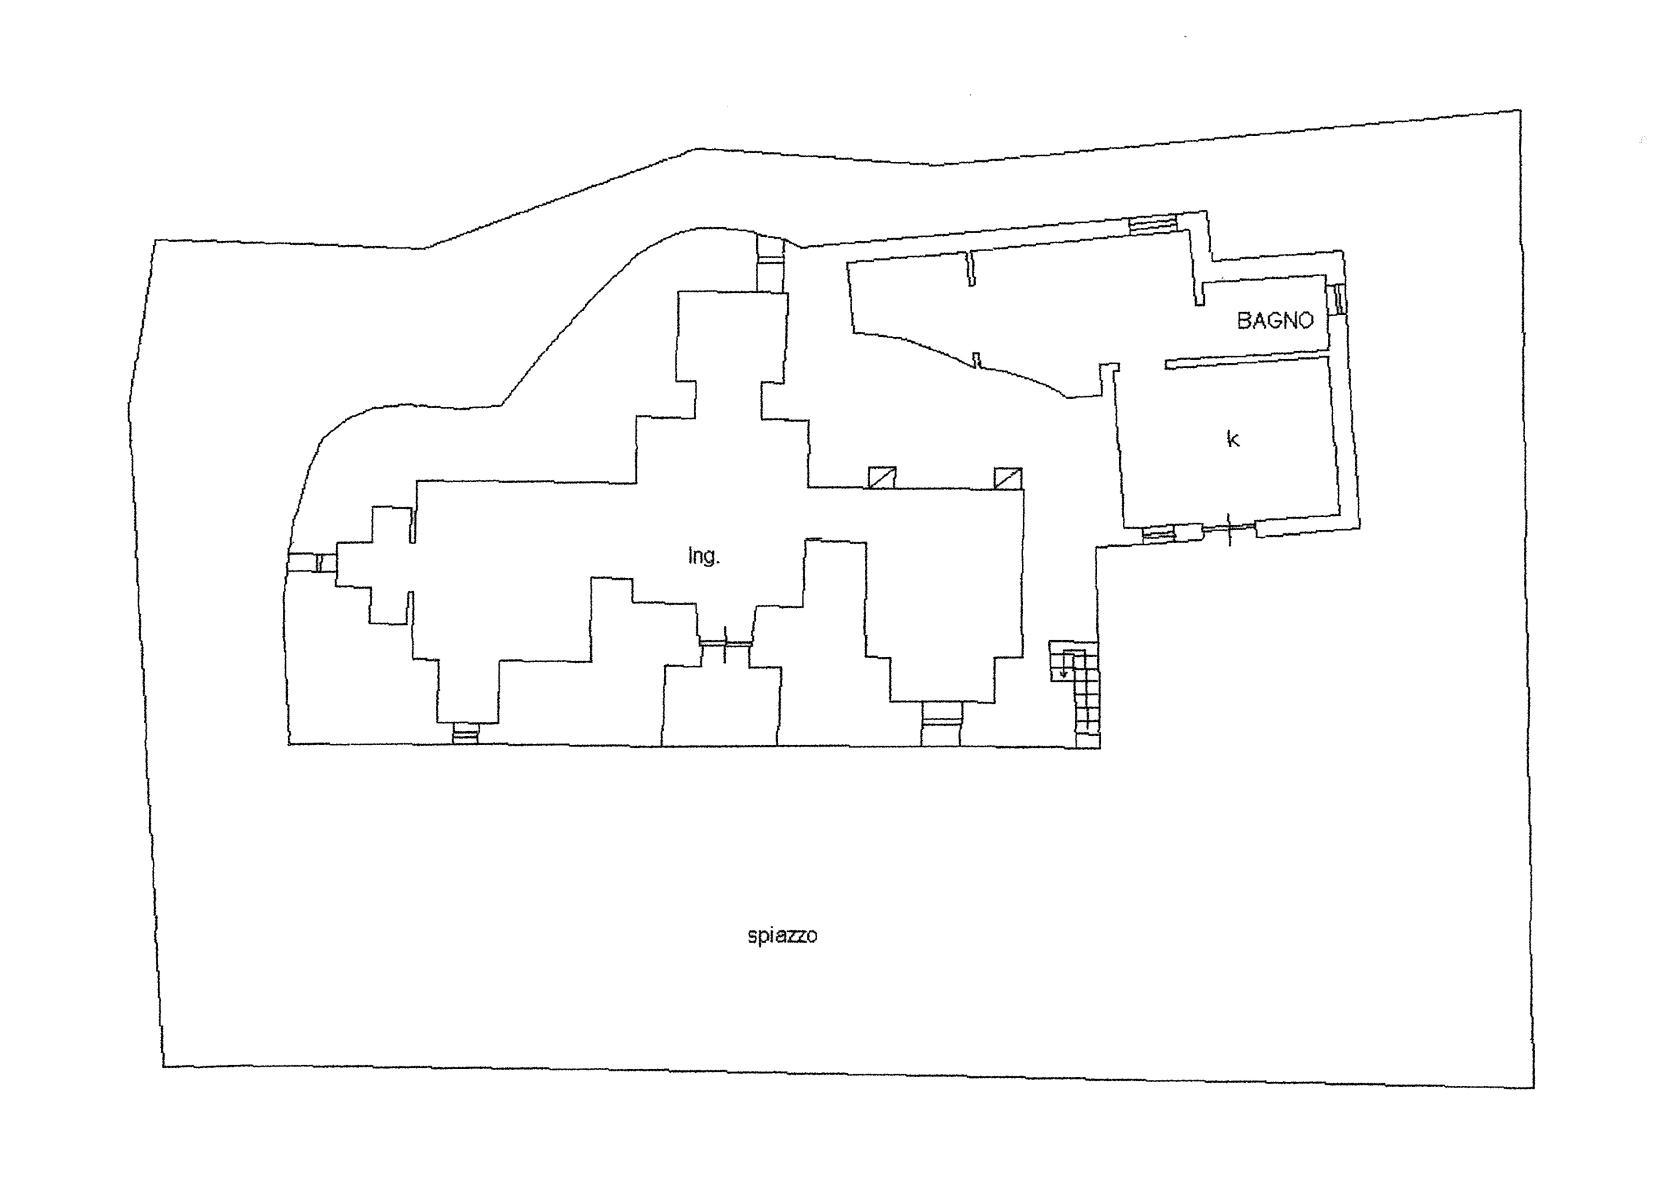 Vendita trulli abitabili – Contrada Grieco, Ostuni (Brindisi)